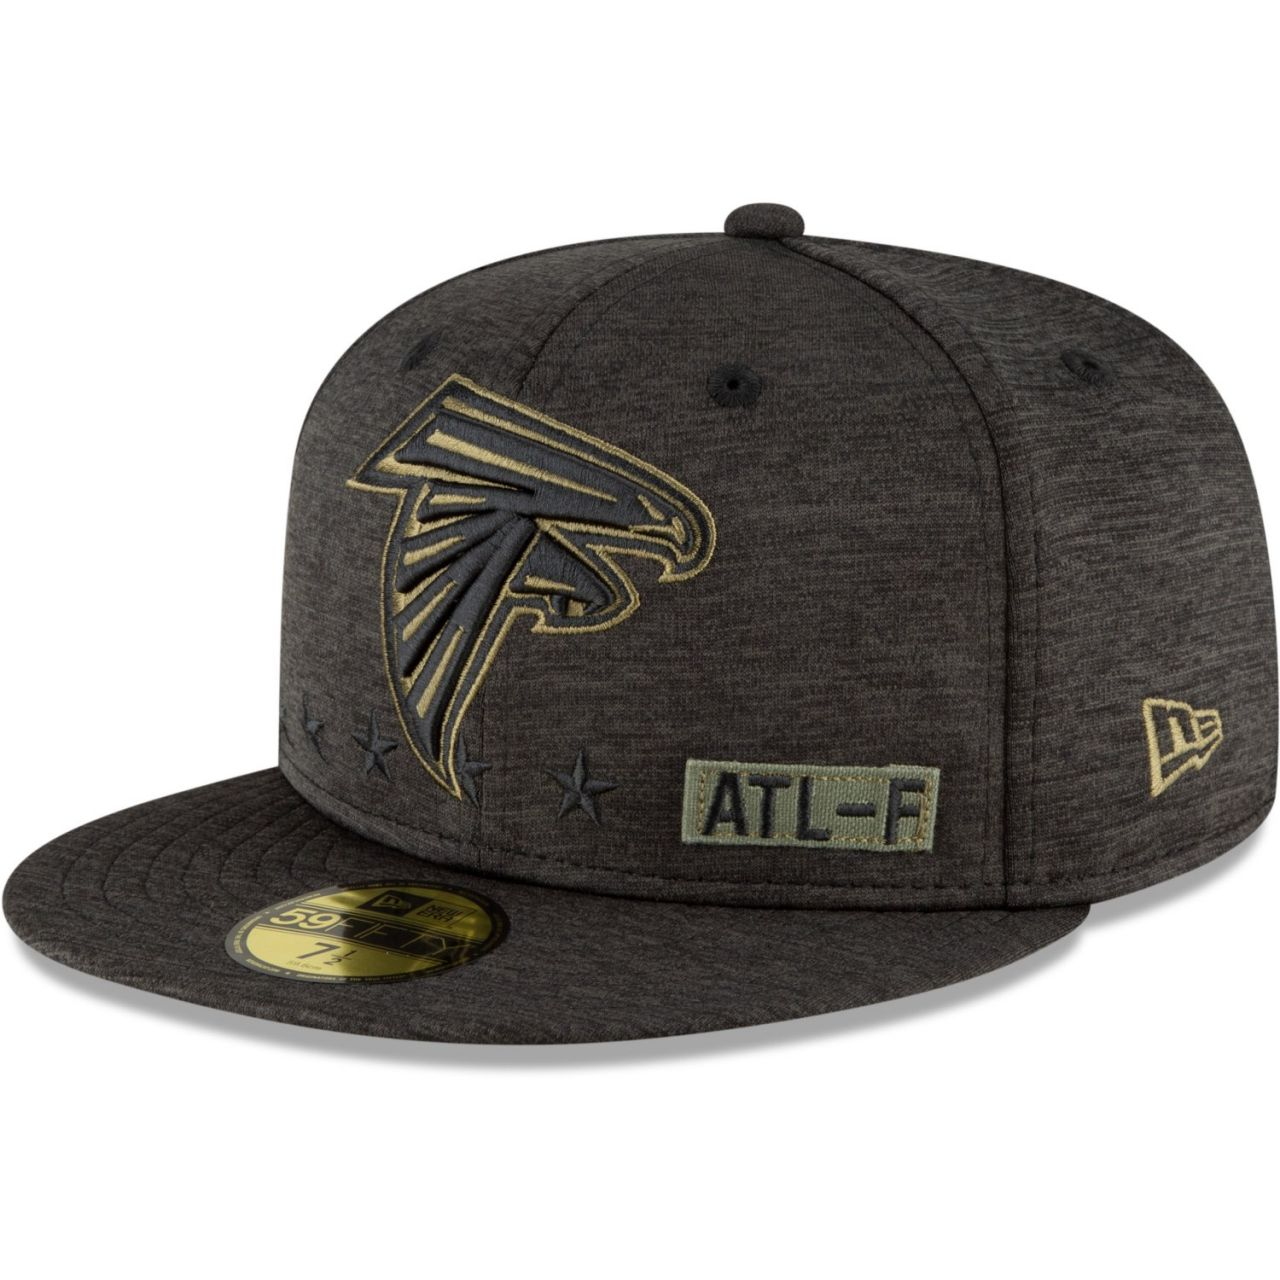 amfoo - New Era 59FIFTY Cap Salute to Service NFL Atlanta Falcons